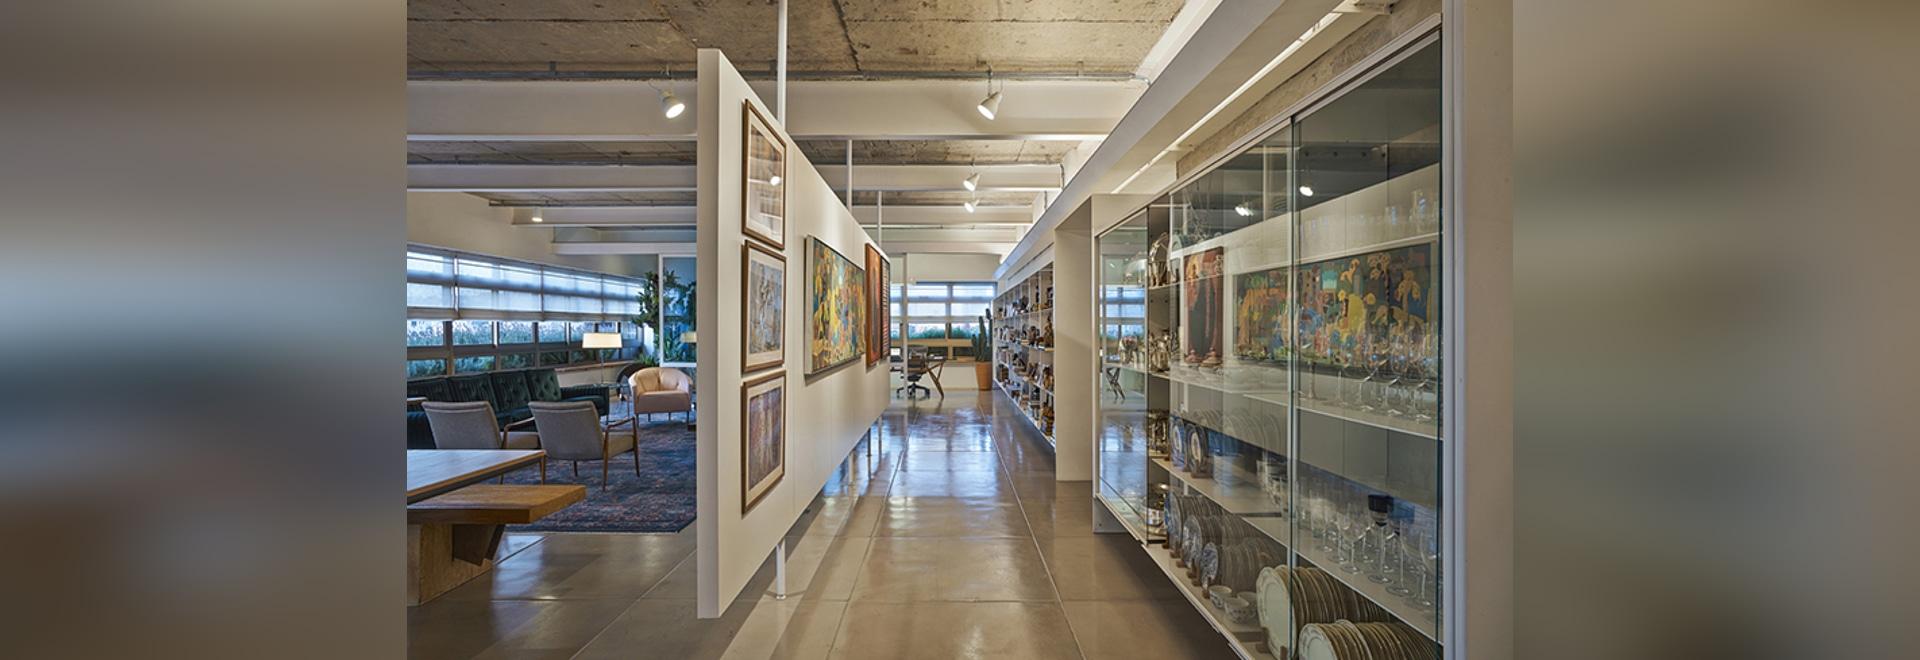 piratininga arquitetos highlights historical features in apartment renovation